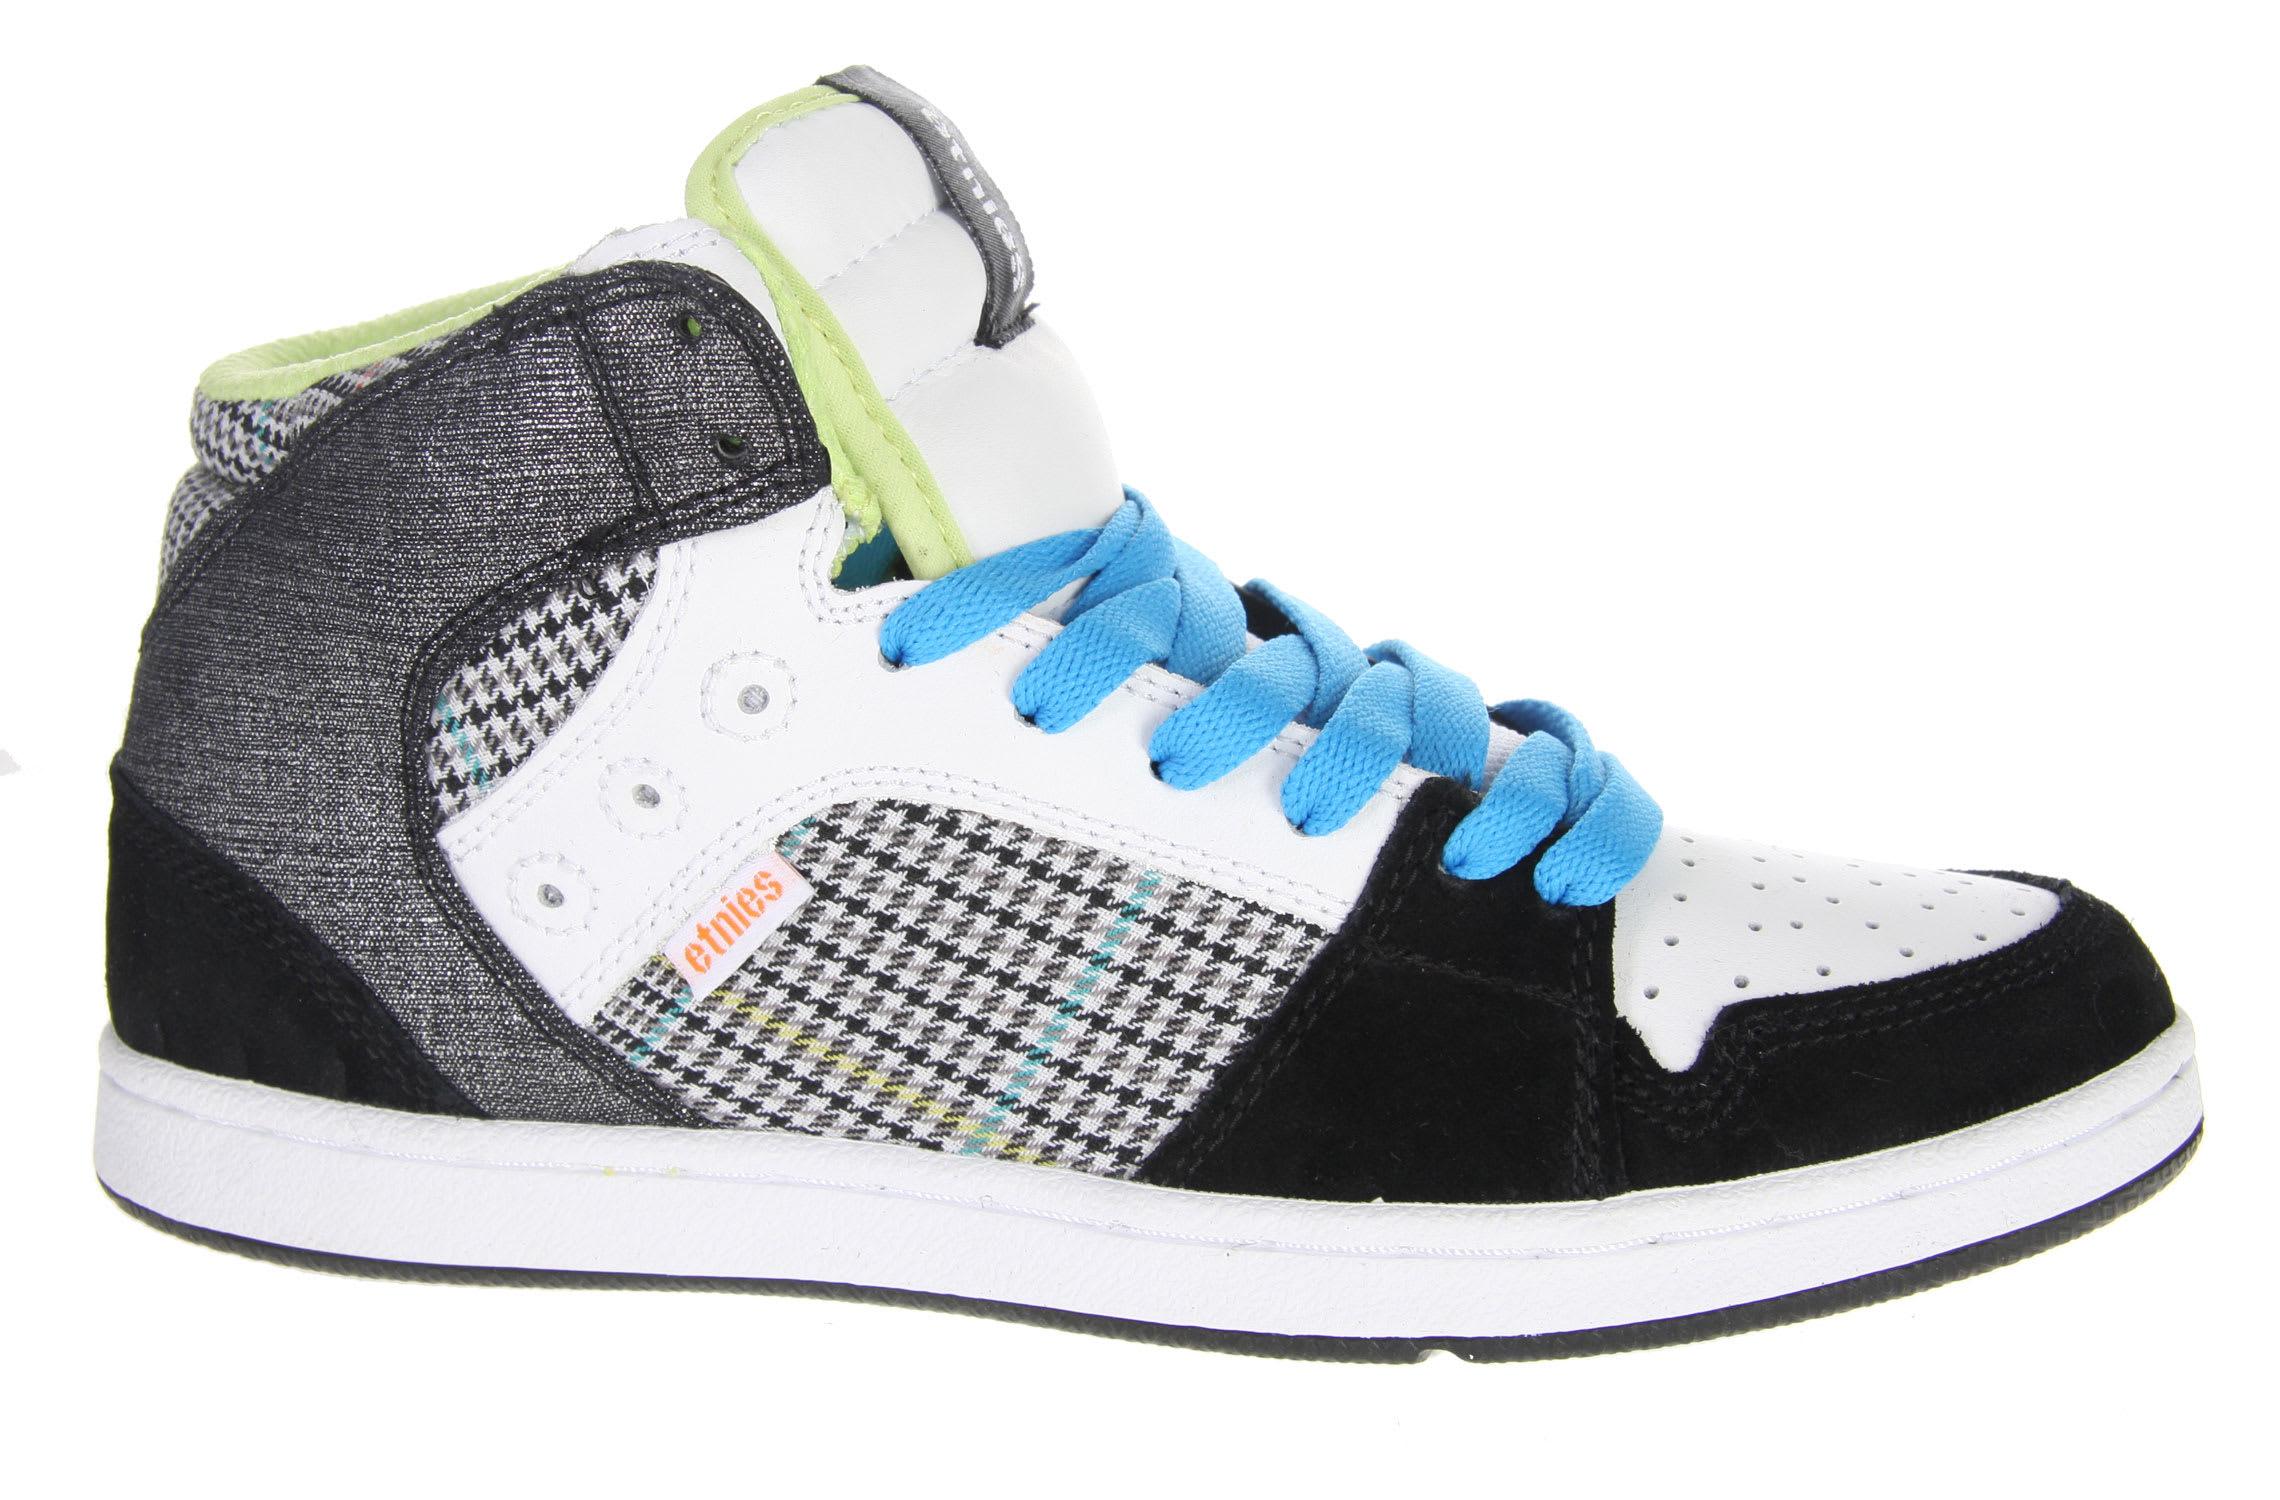 Etnies Perry Mid Skate Shoes - thumbnail 1 2a77dc532c